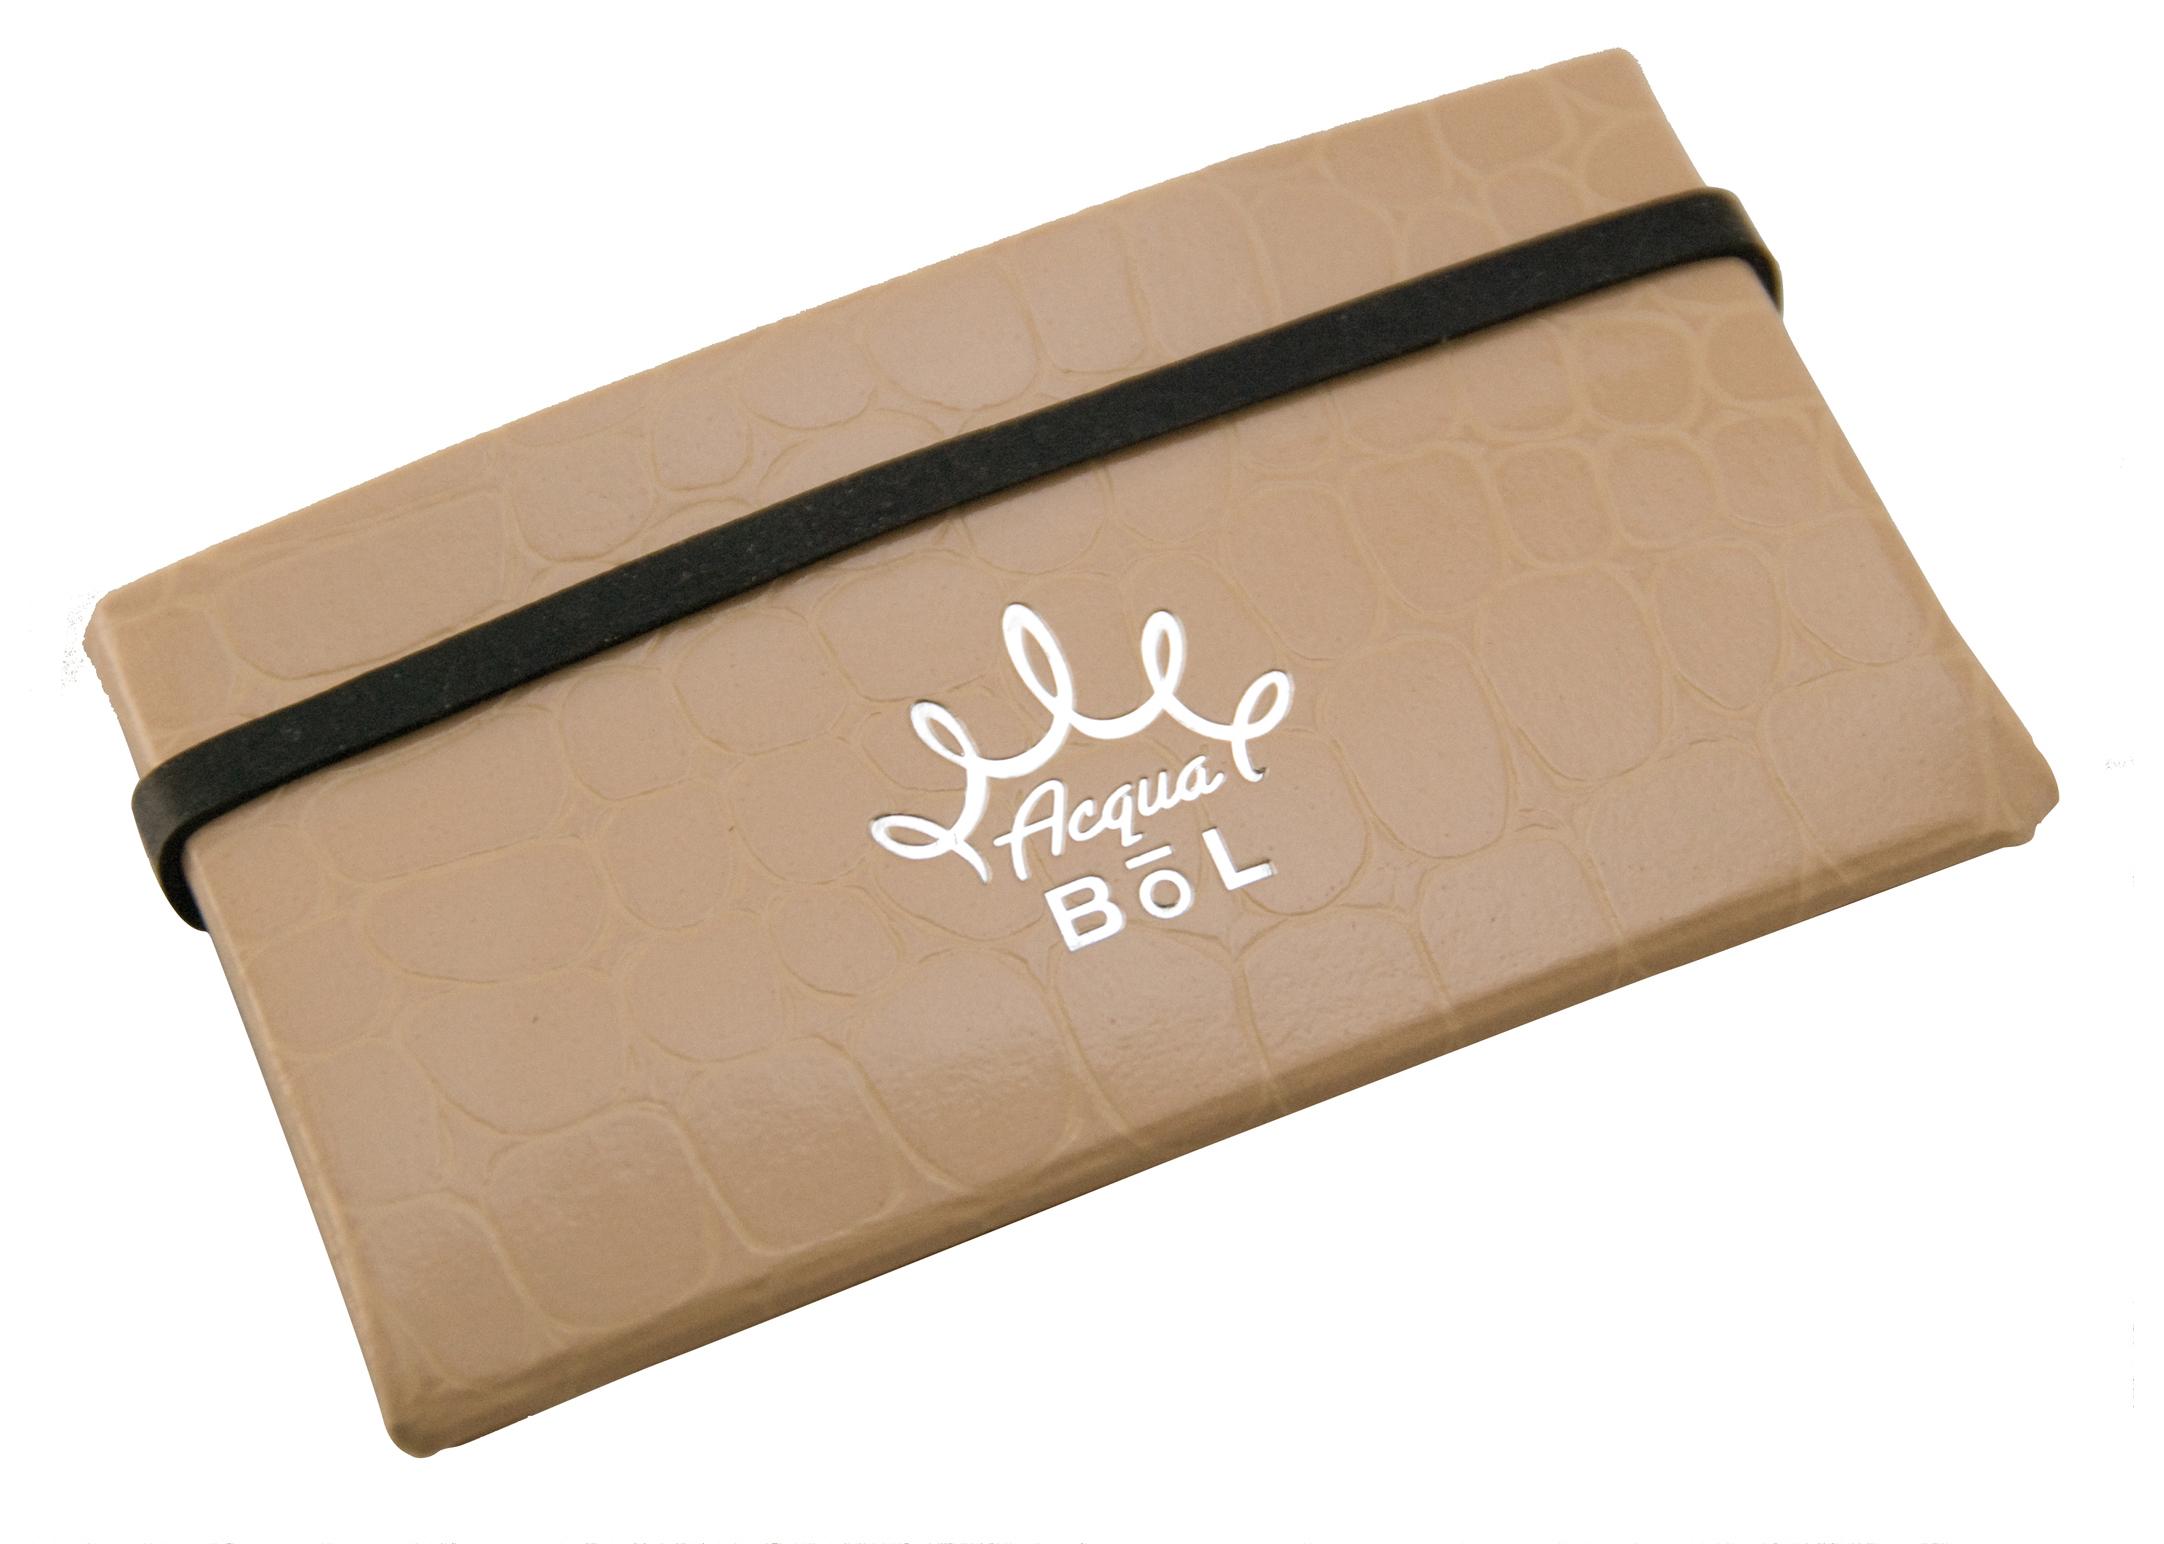 Wowbow Acqua Bol Croco-Tan Travel Accessories